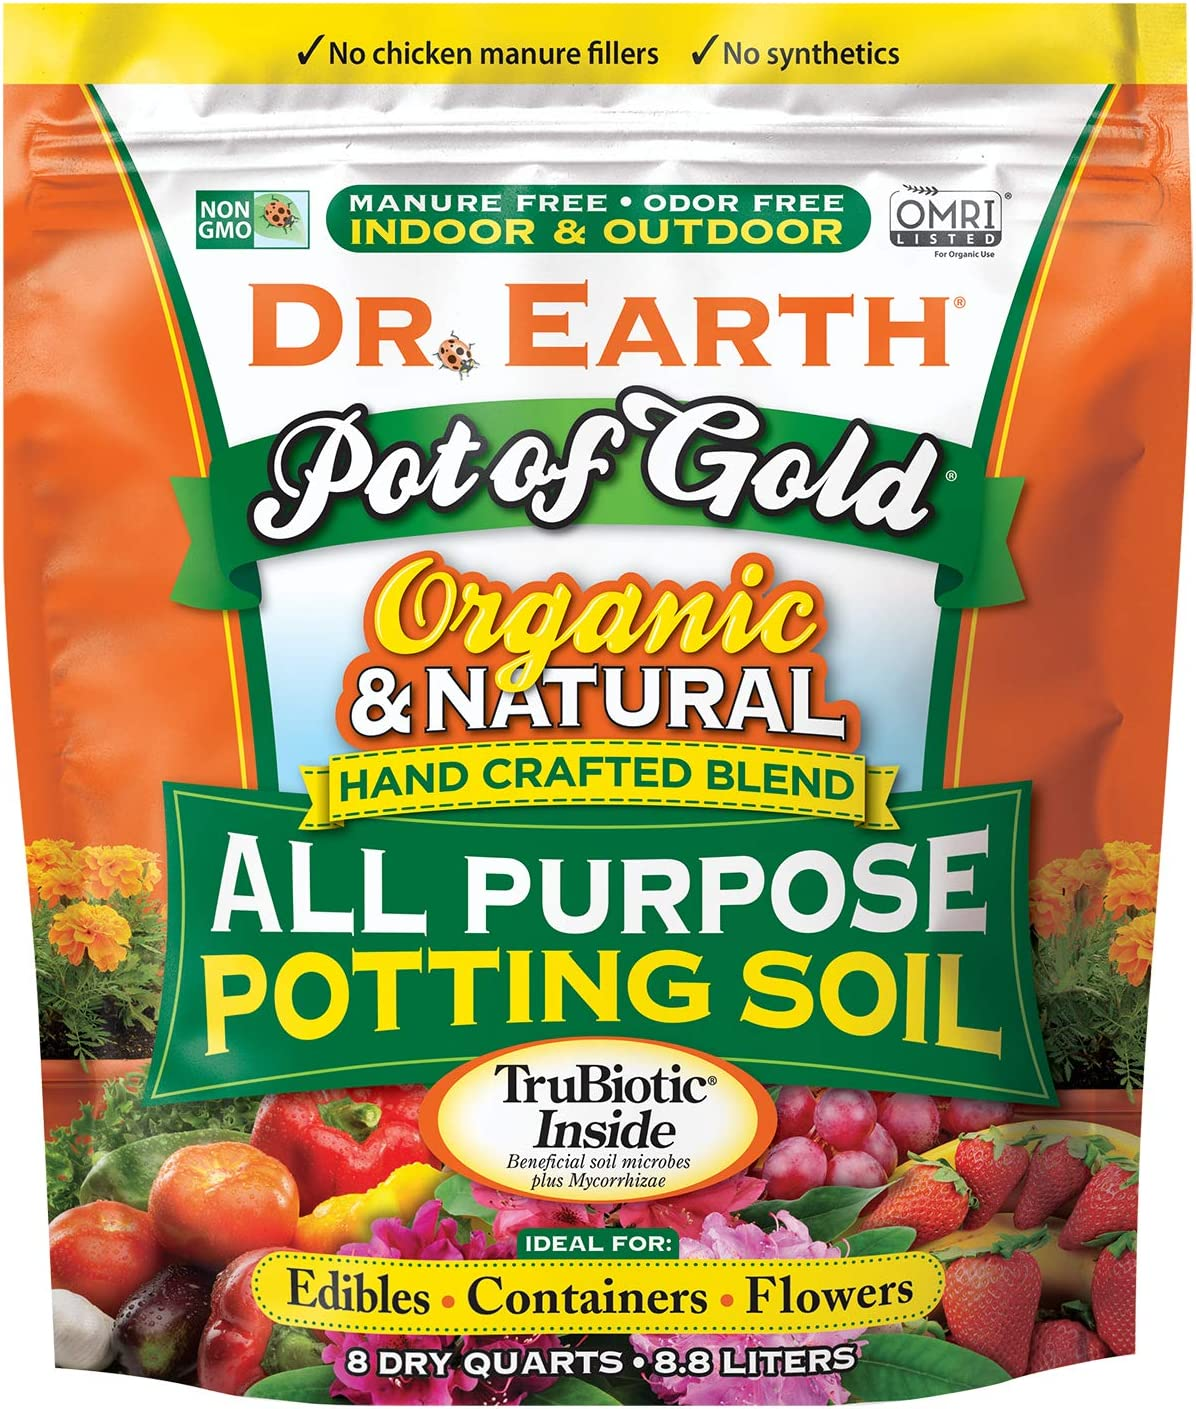 Dr. Earth Pot of Gold All Purpose Potting Soil 8 qt